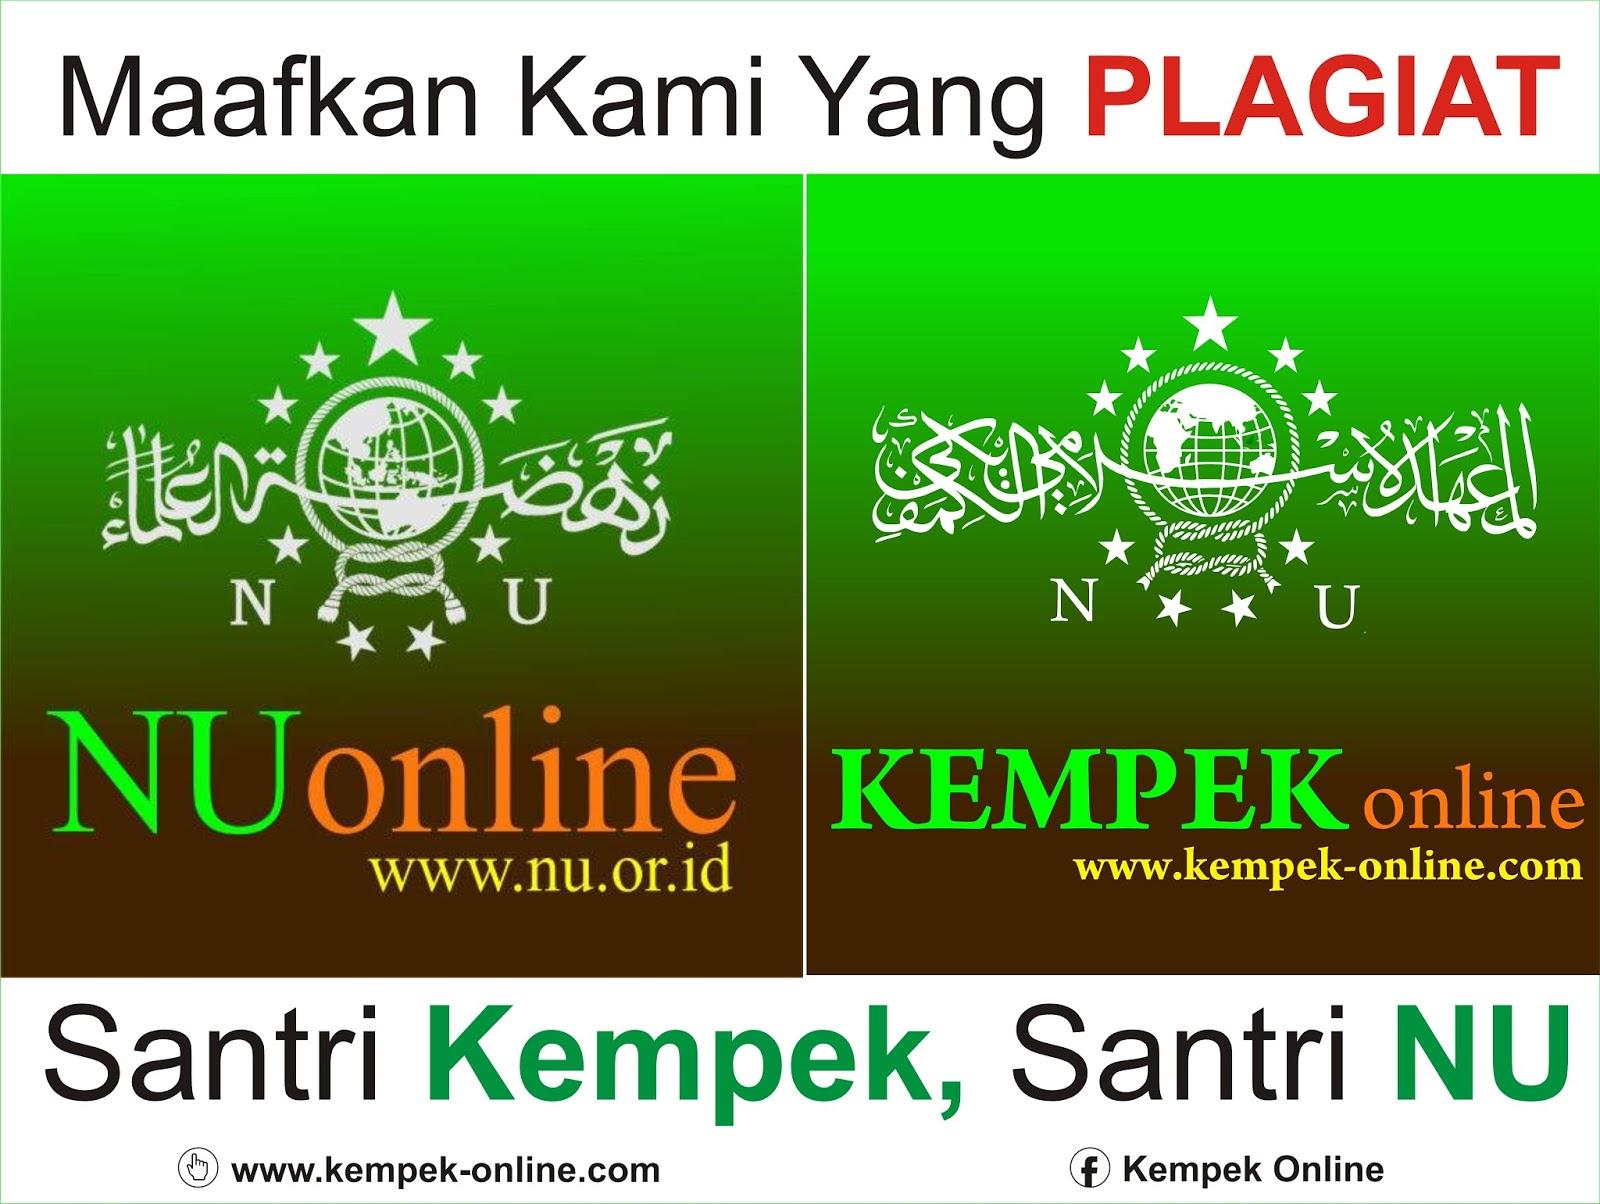 Santri Kempek Santri NU Kempek Online